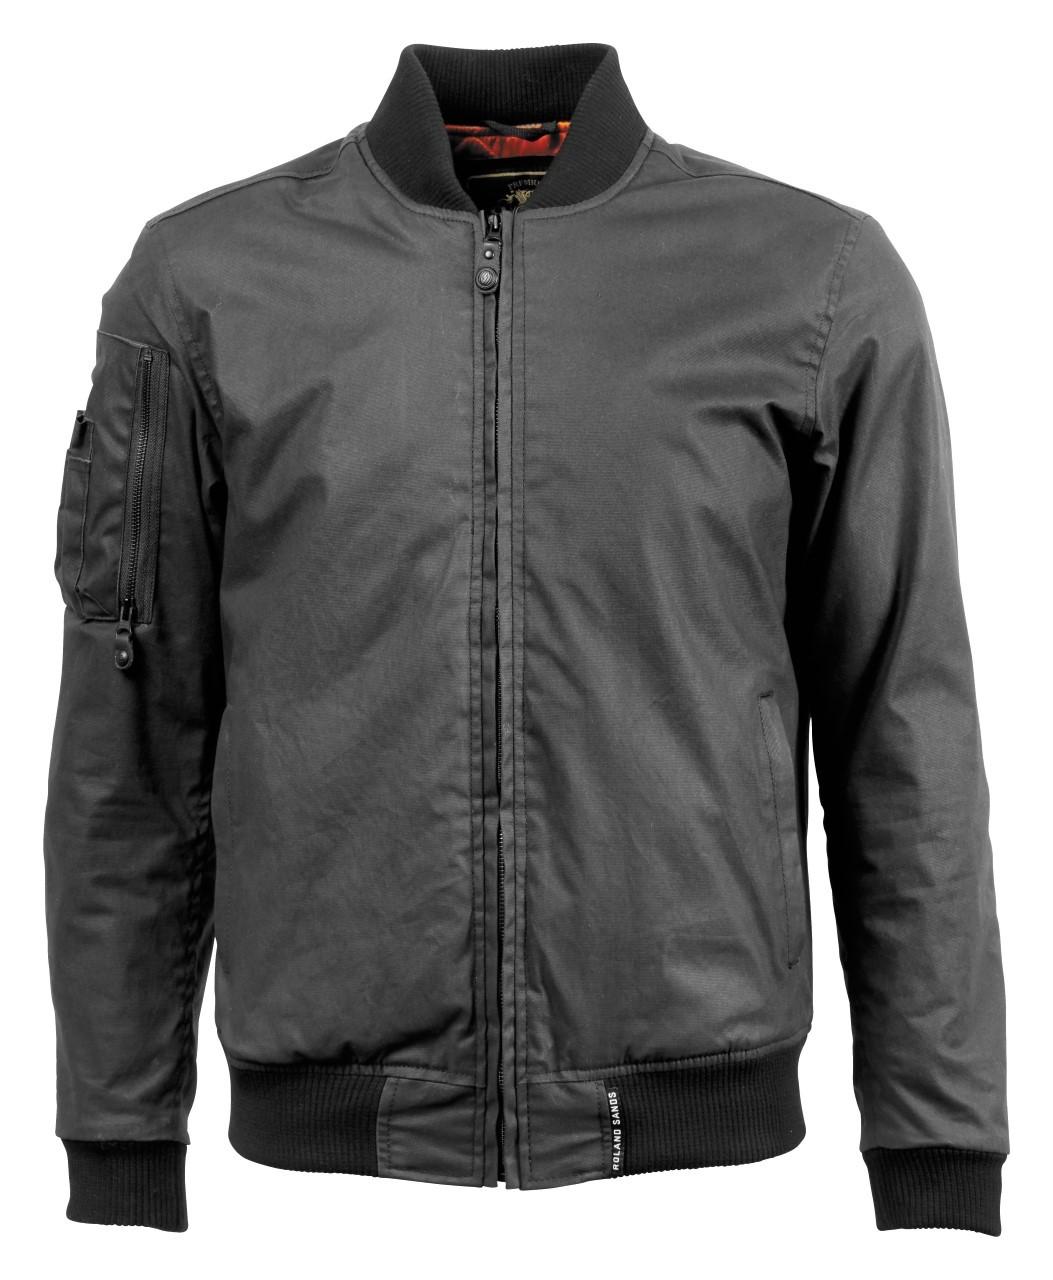 Bmw Textile Motorcycle Jackets